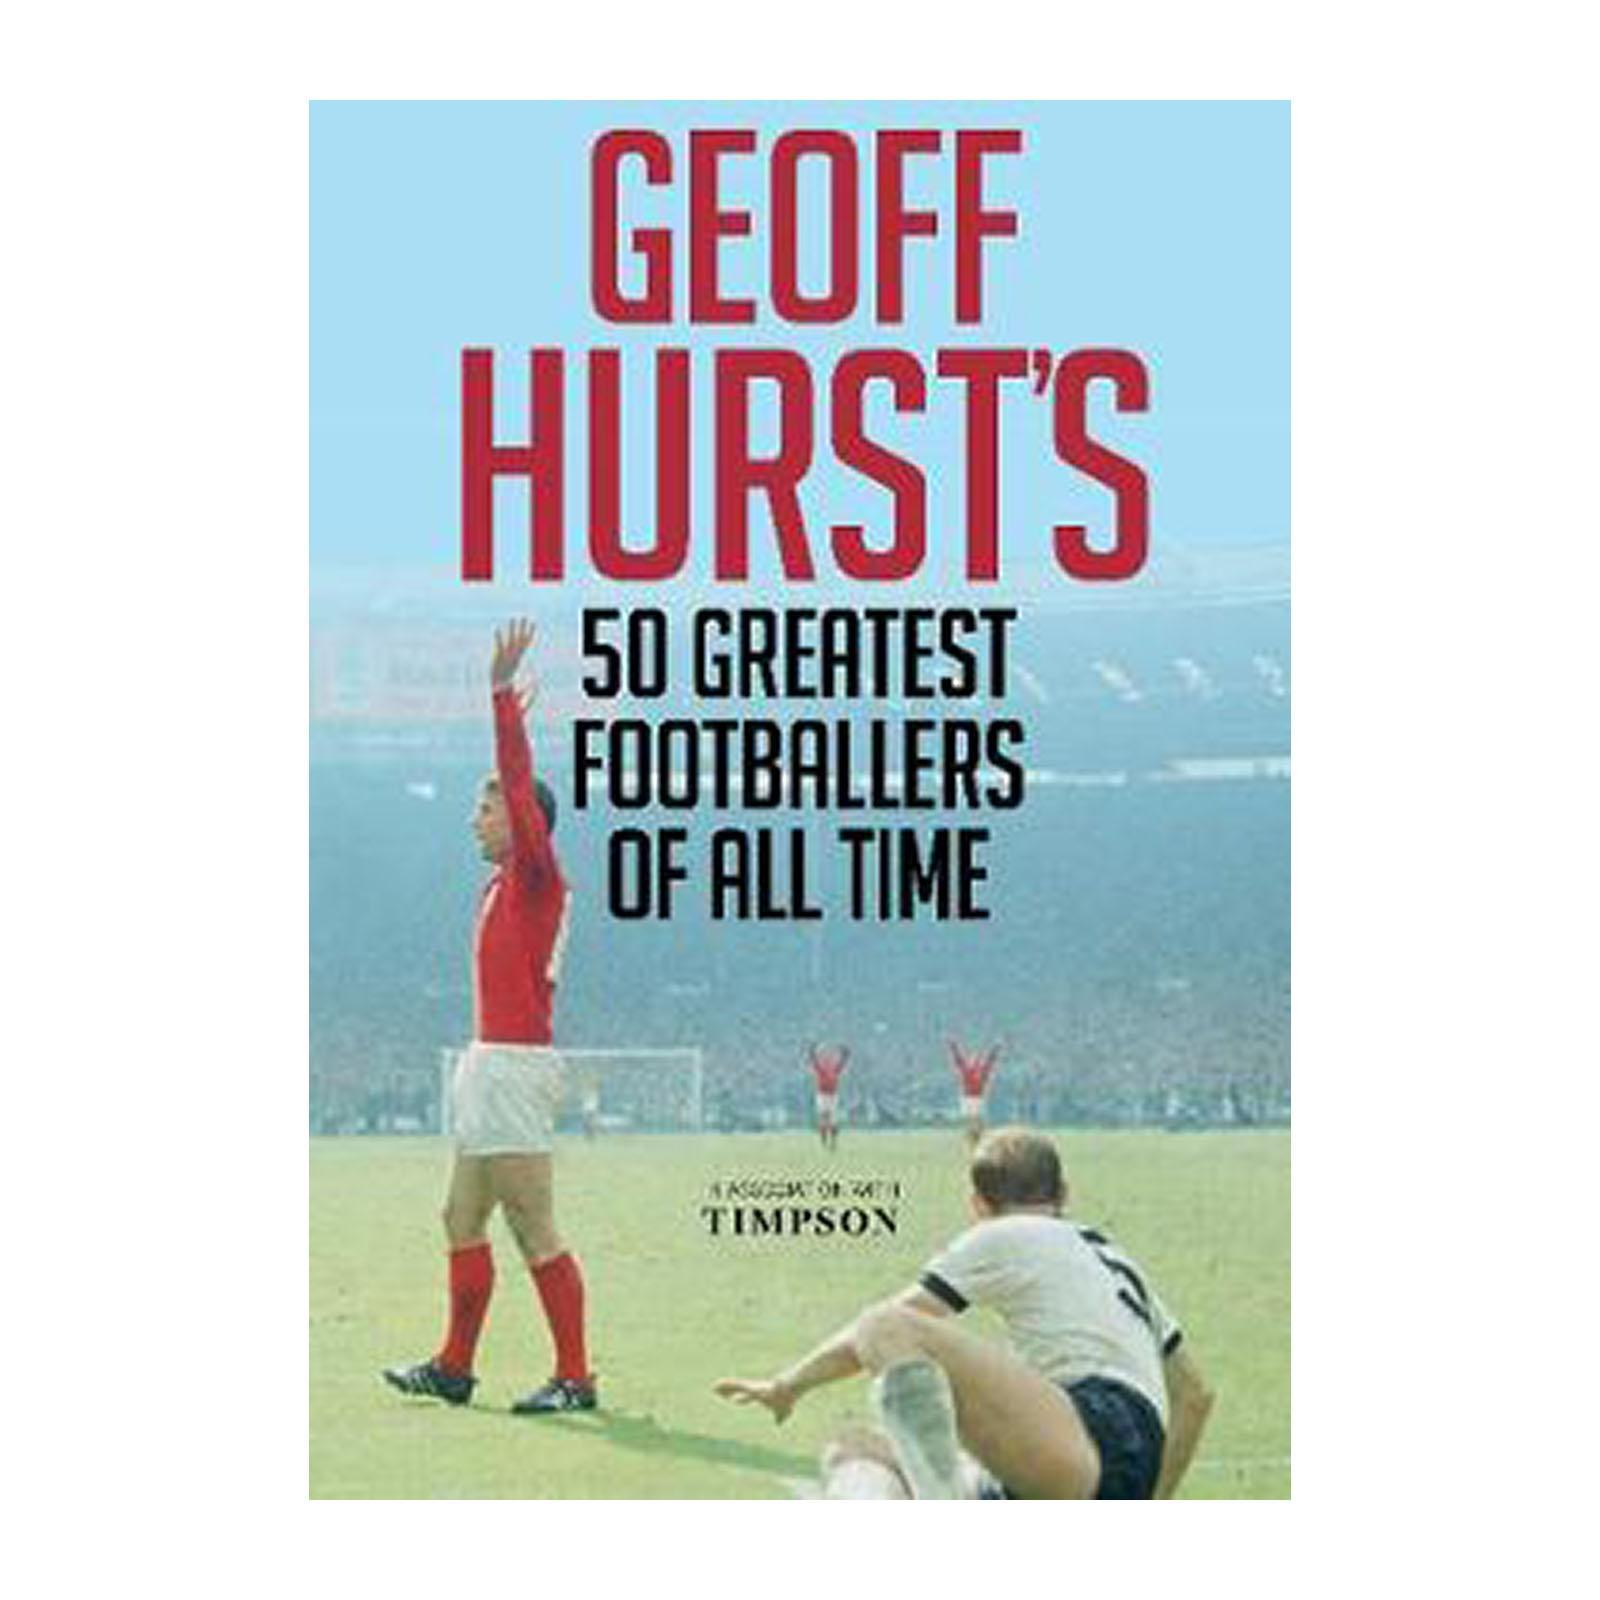 Geoff Hursts 50 Greatest Footballers Of All Time (Hardback)